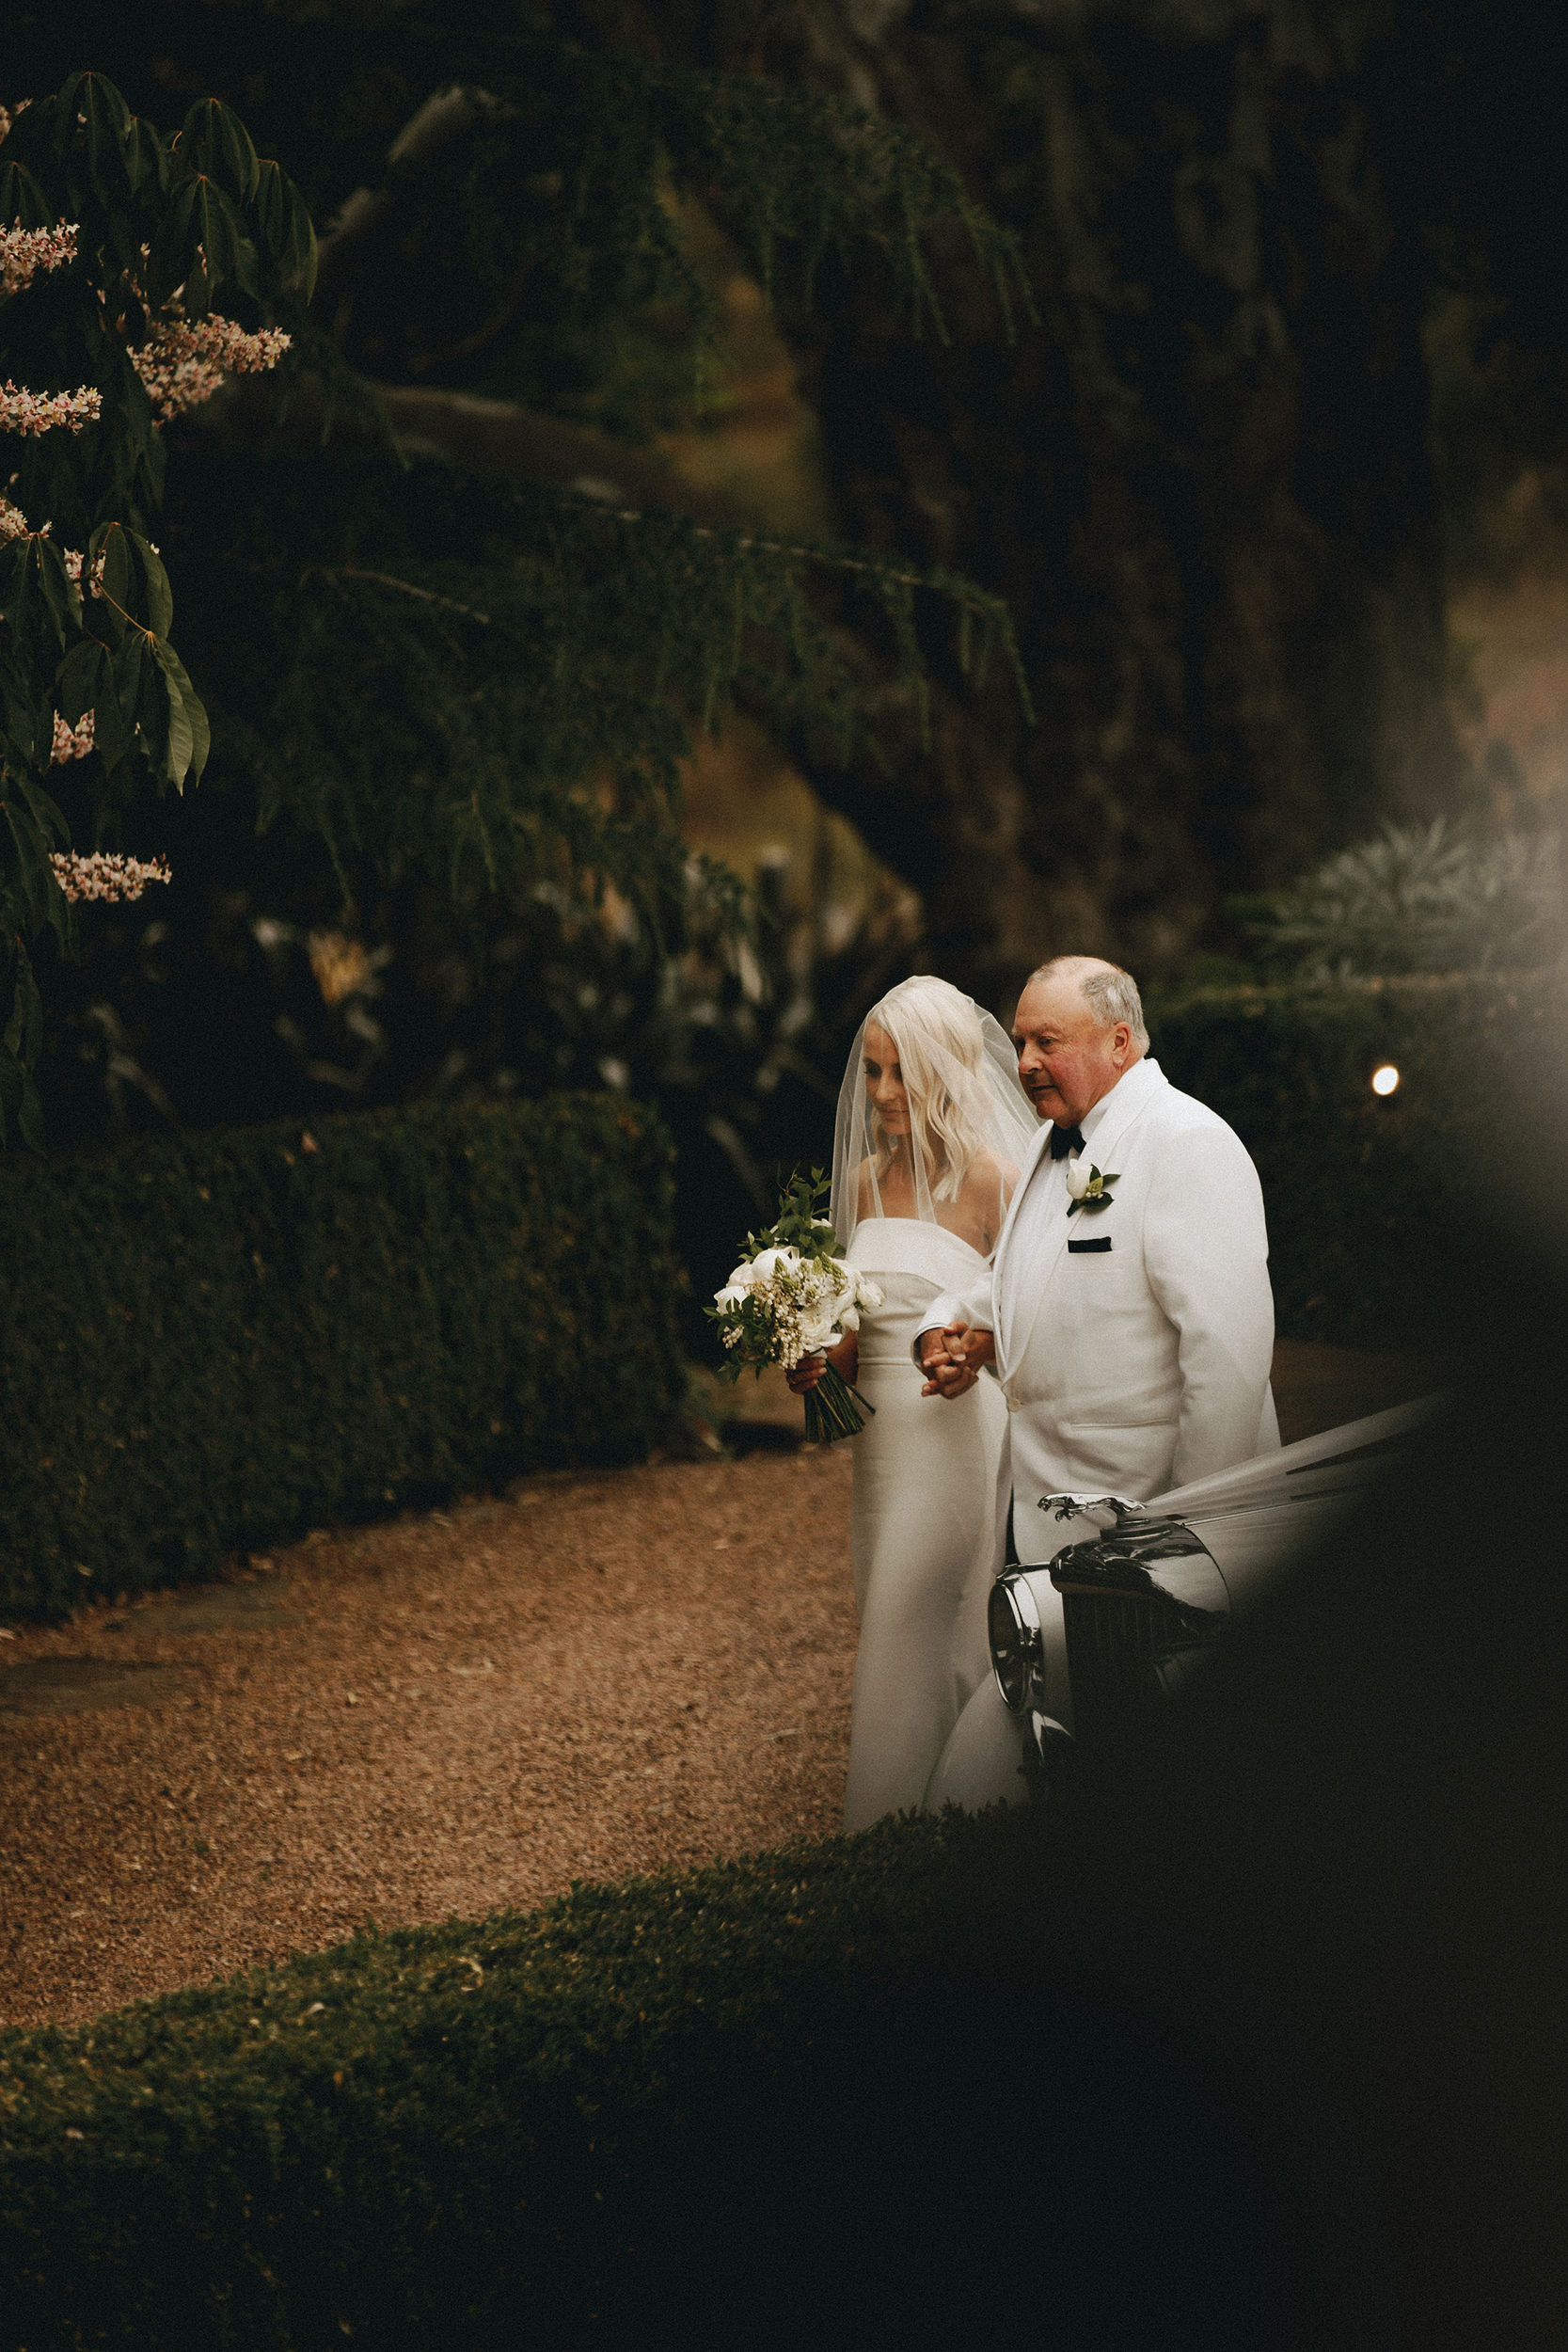 BYBHS_HYGGE_WEDDING_DAN&BEC_HI-RES_83.jpg